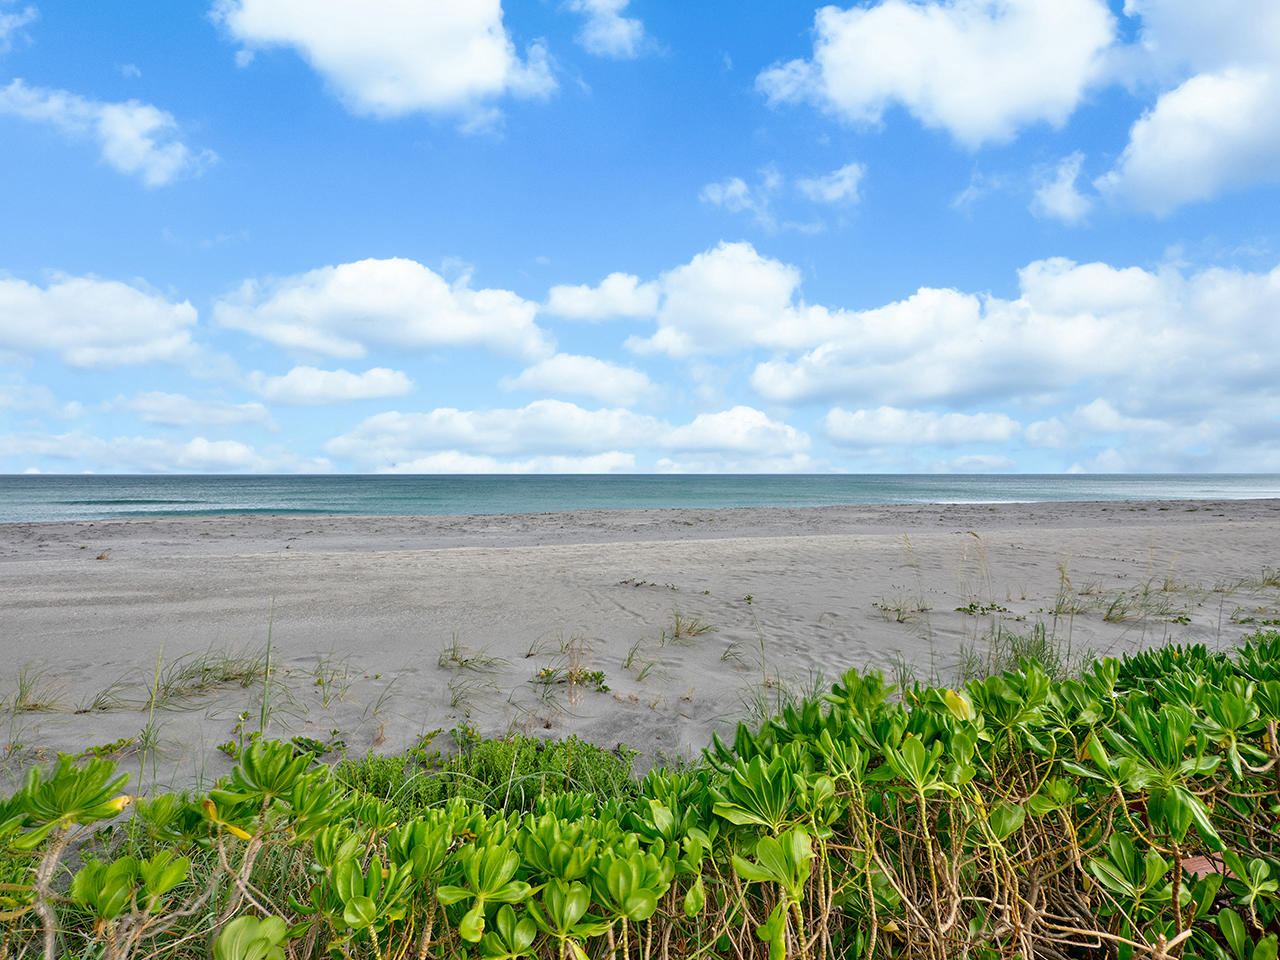 JUPITER ISLAND HOBE SOUND FLORIDA